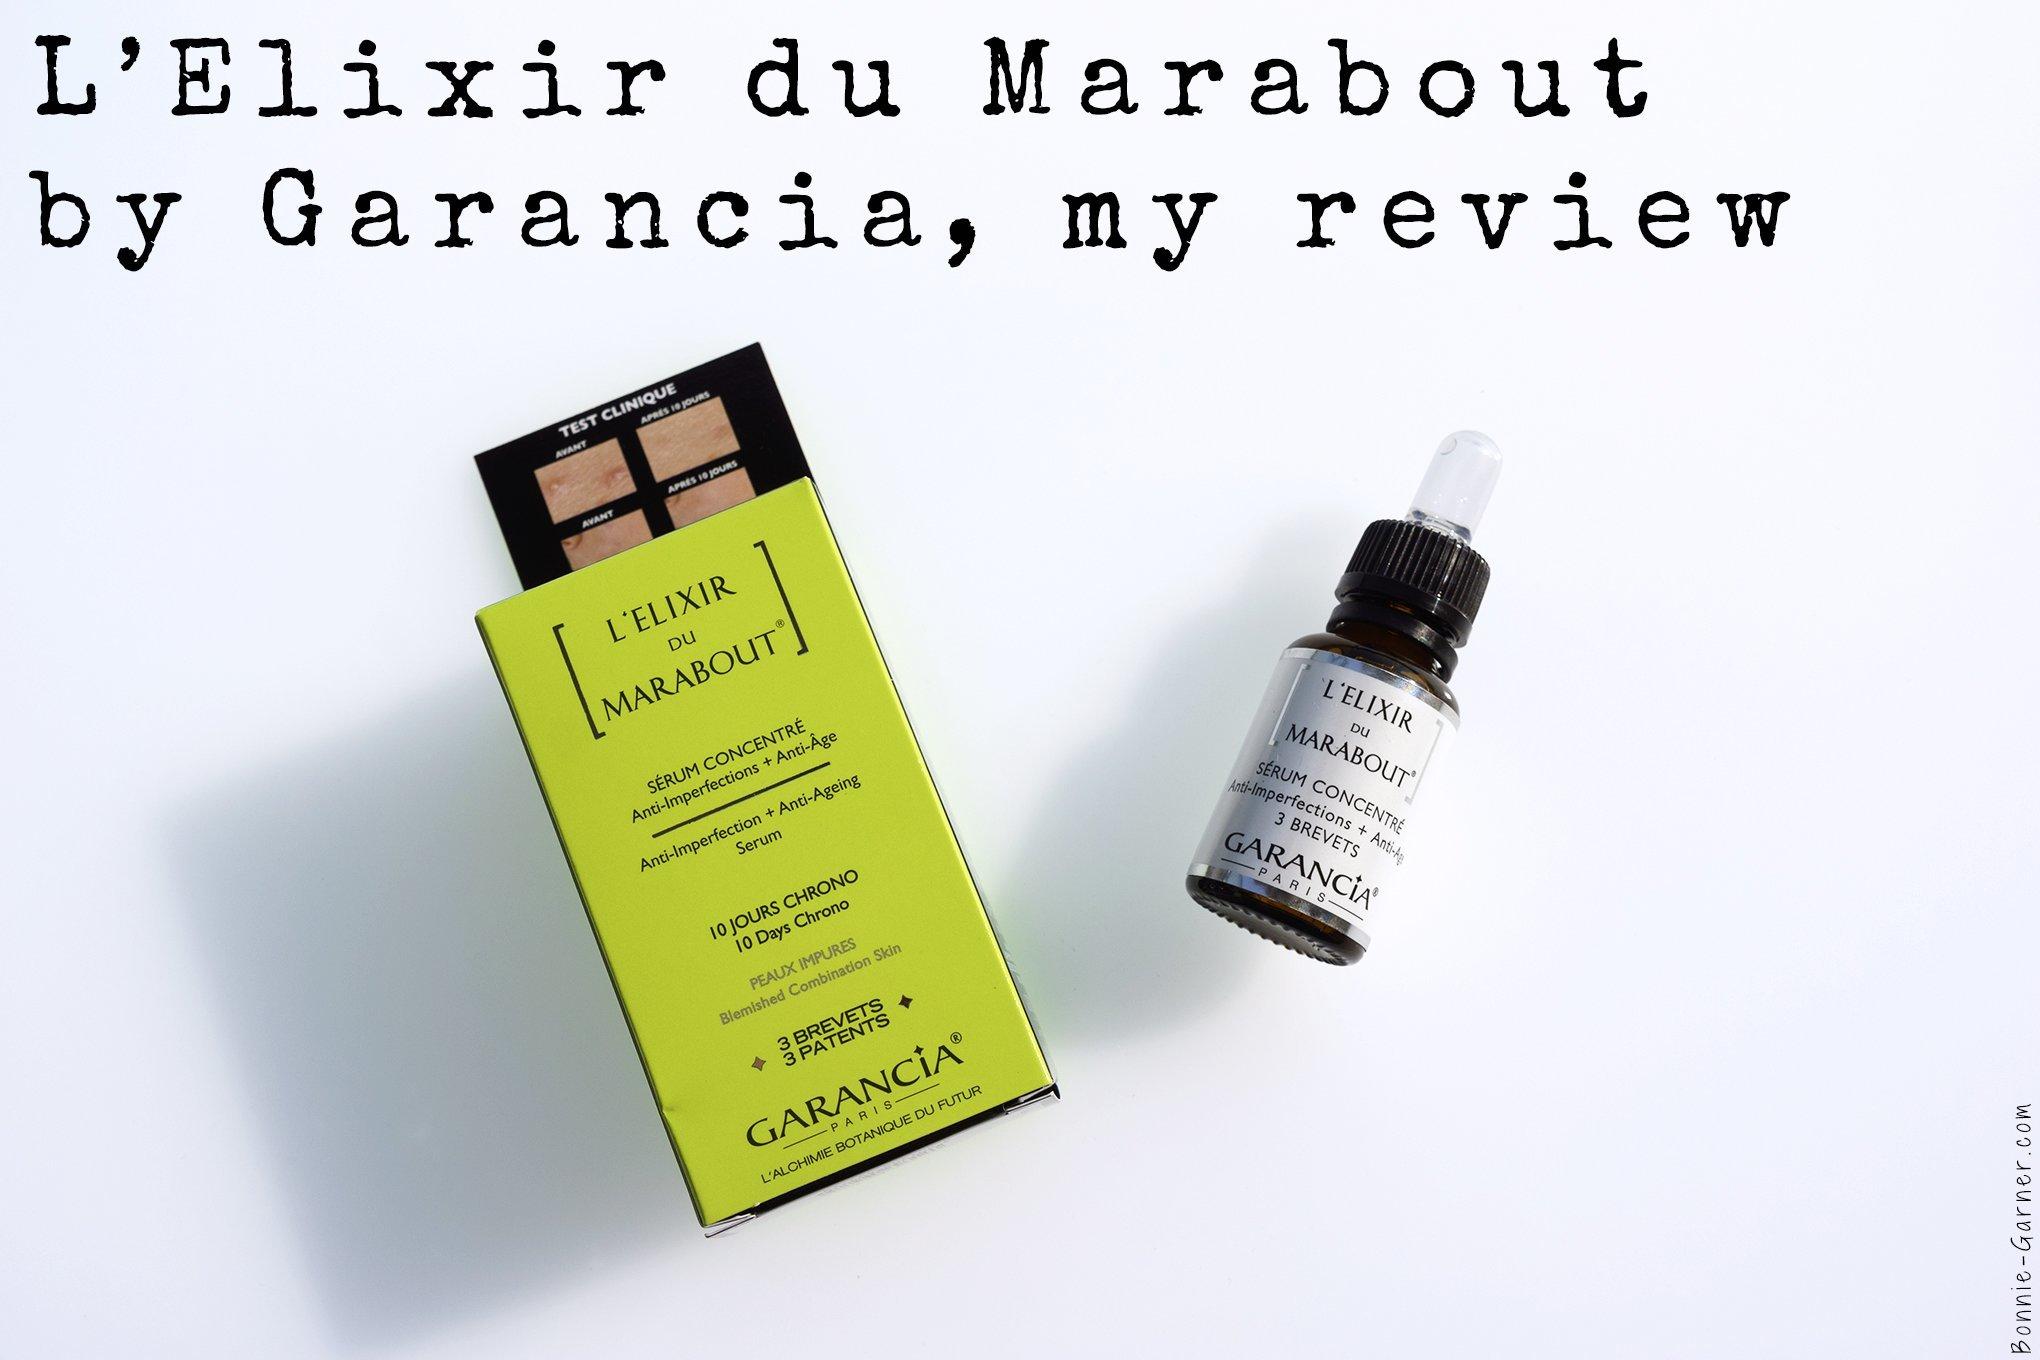 L'Elixir du Marabout by Garancia, my review